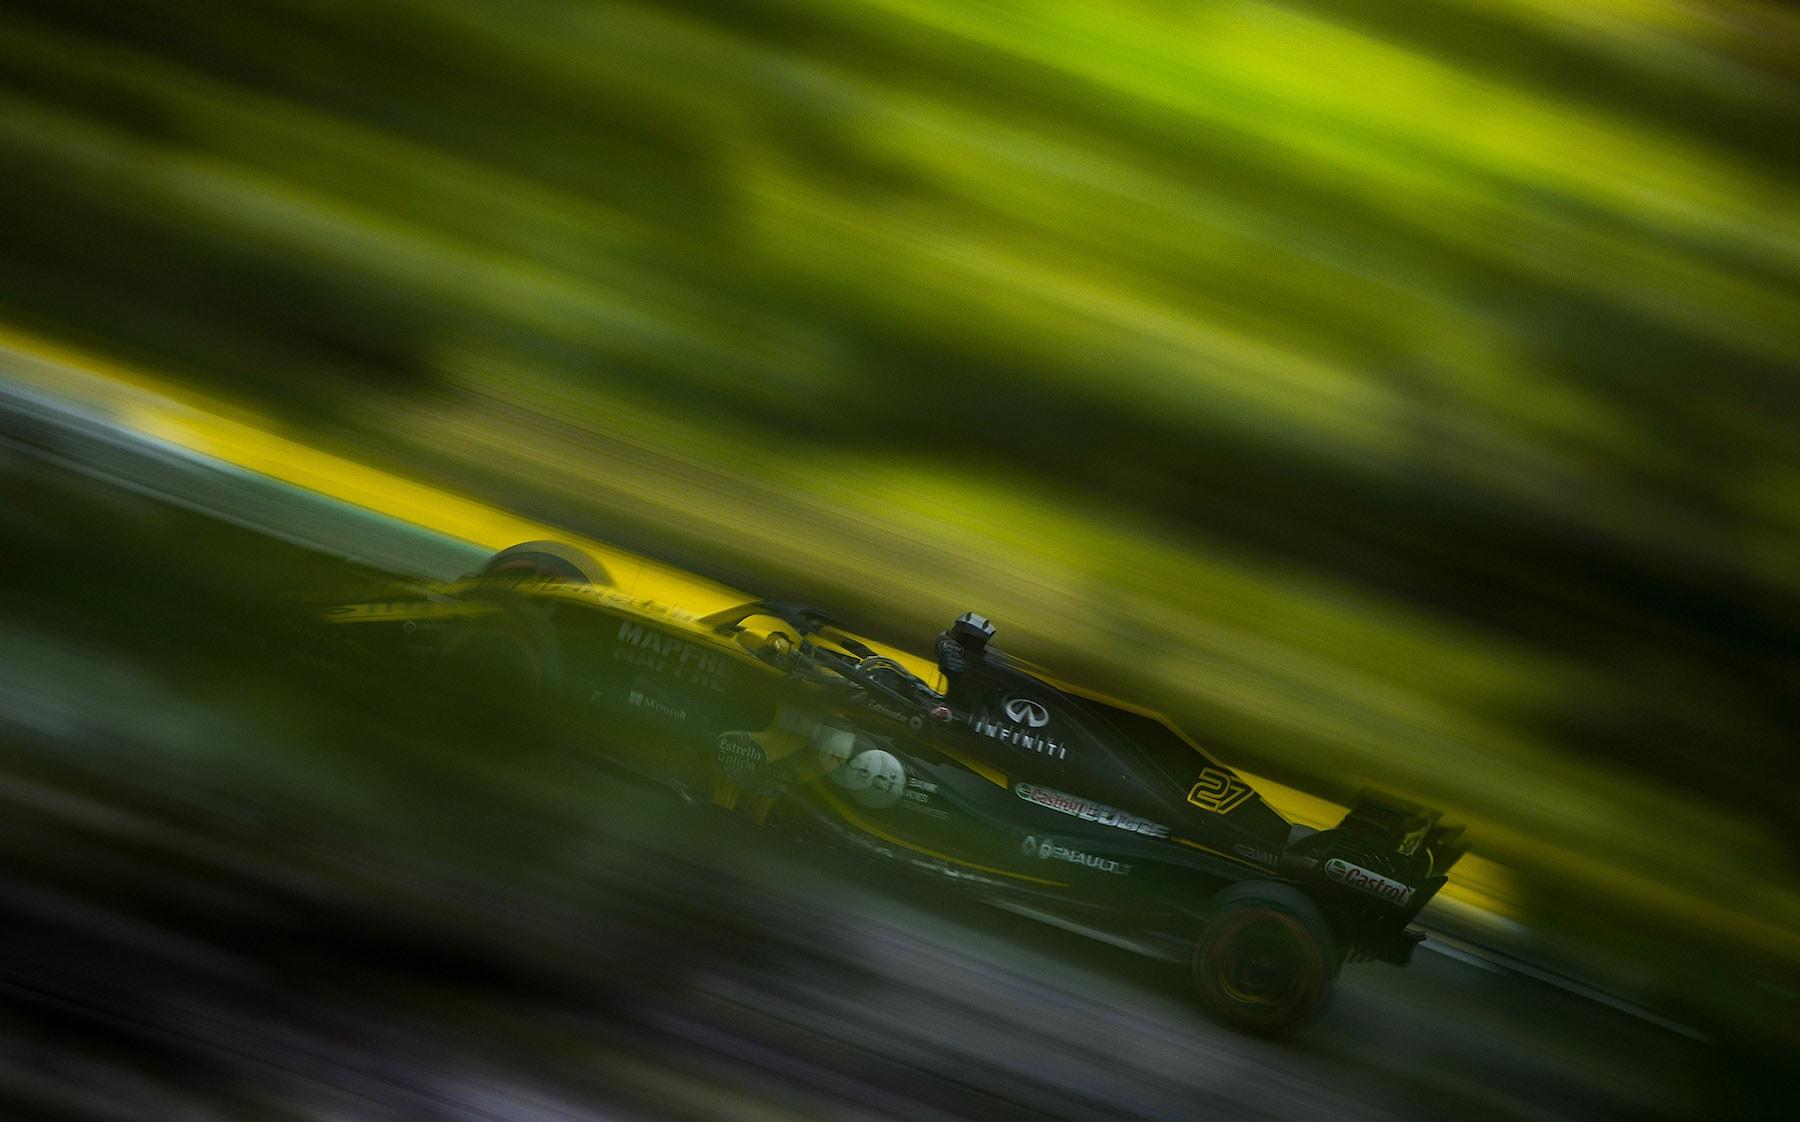 1 2018 Nico Hulkenberg | Renault RS18 | 2018 Brazilian GP Q 1 copy.jpg